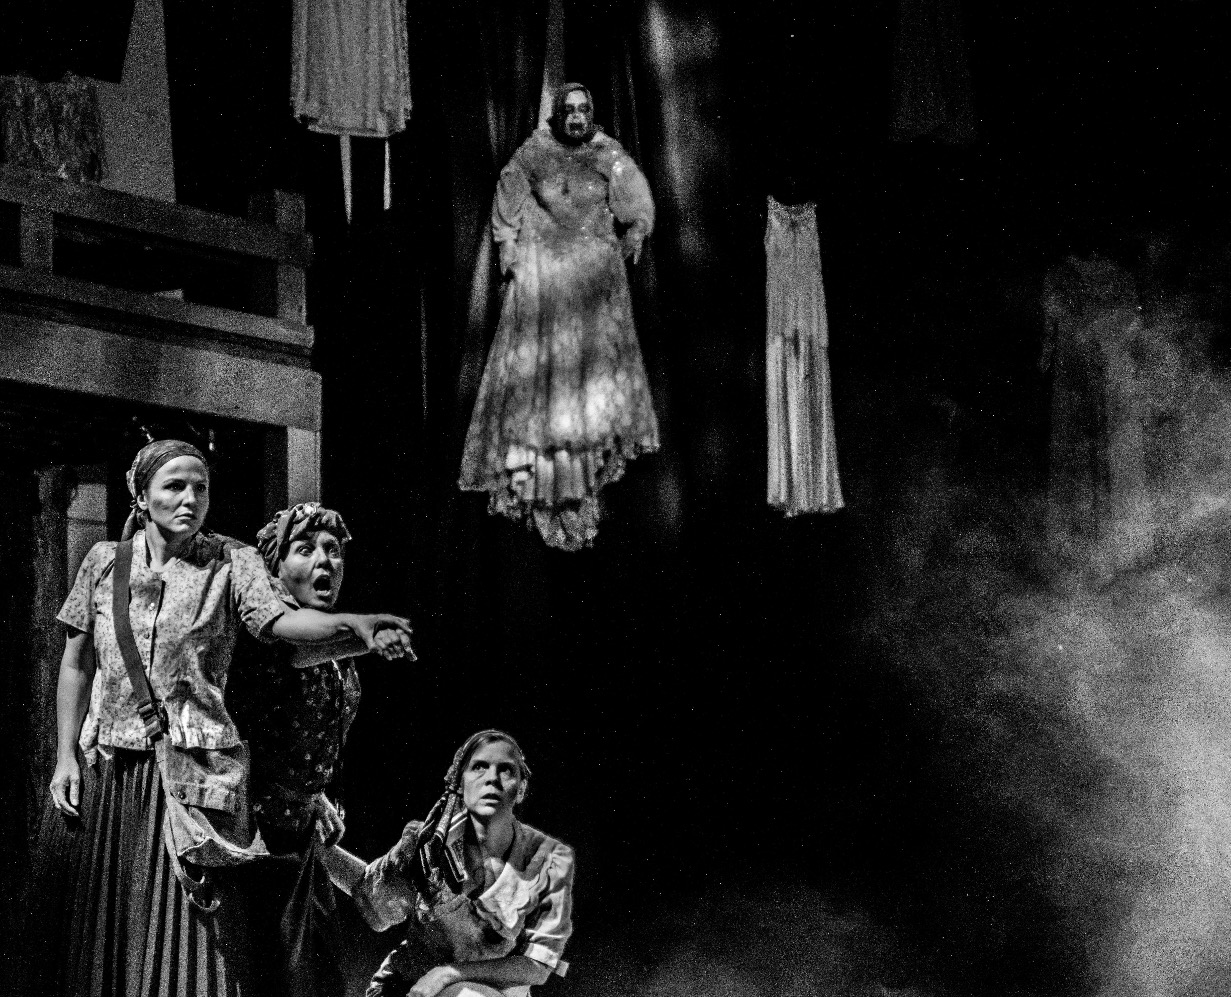 Witch 1- Macbeth